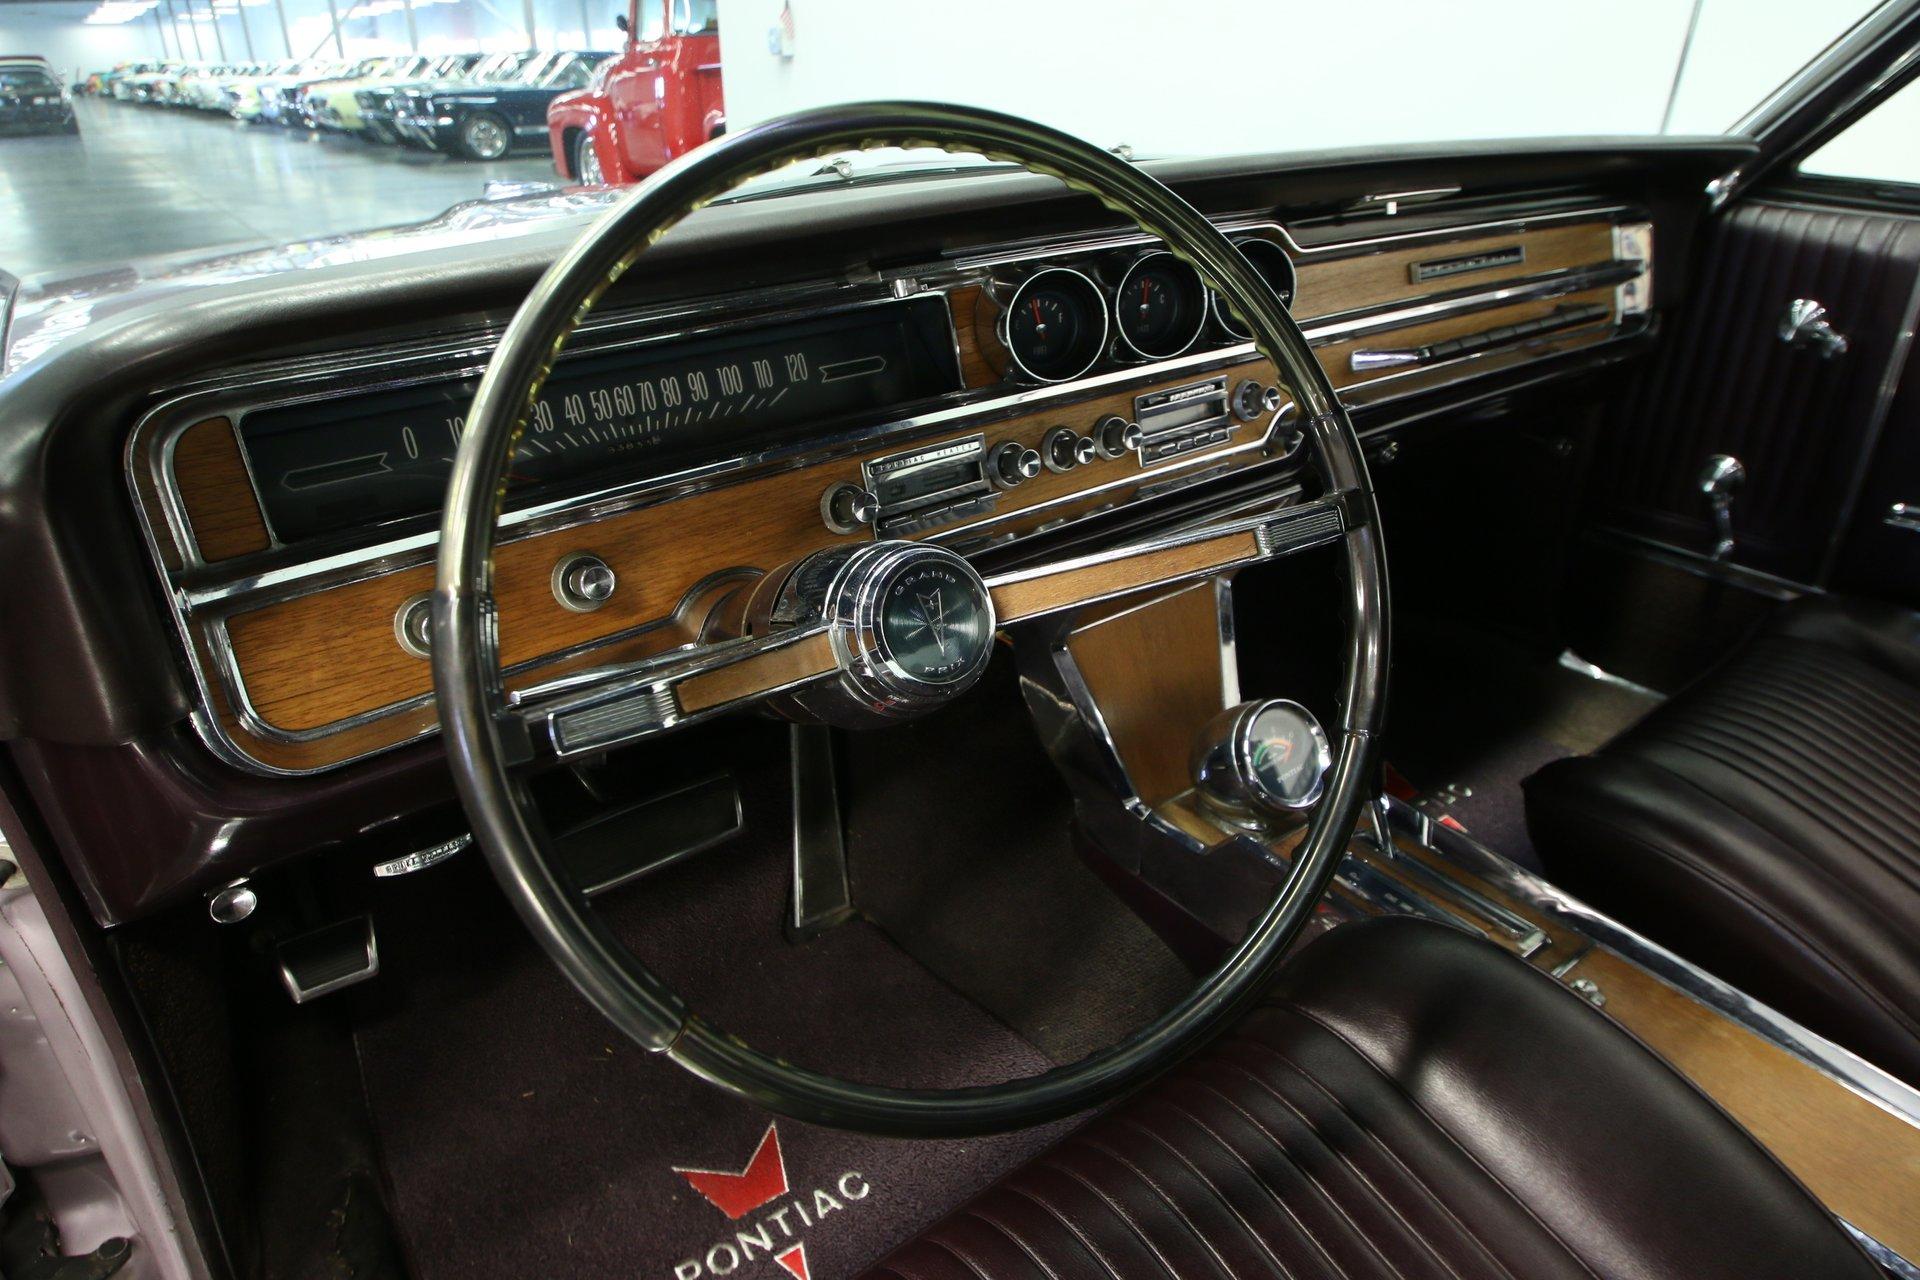 1965 Pontiac Grand Prix Classic Cars For Sale Streetside Classics The Nation S 1 Consignment Dealer